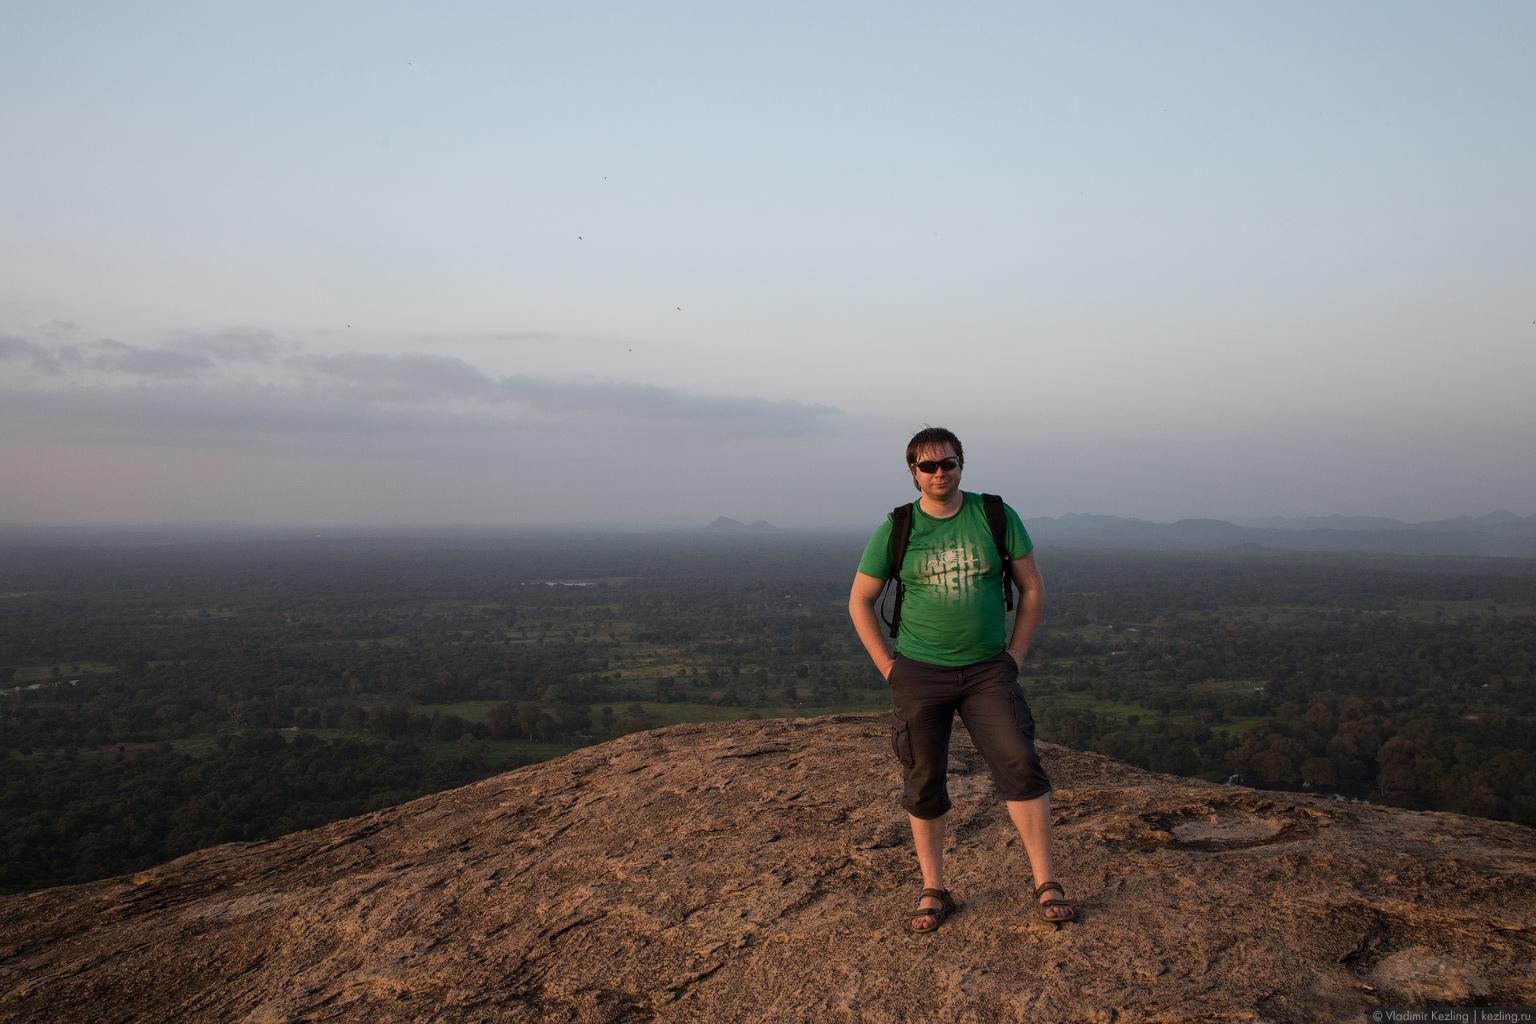 Пидурангала, Шри-Ланка, 2014